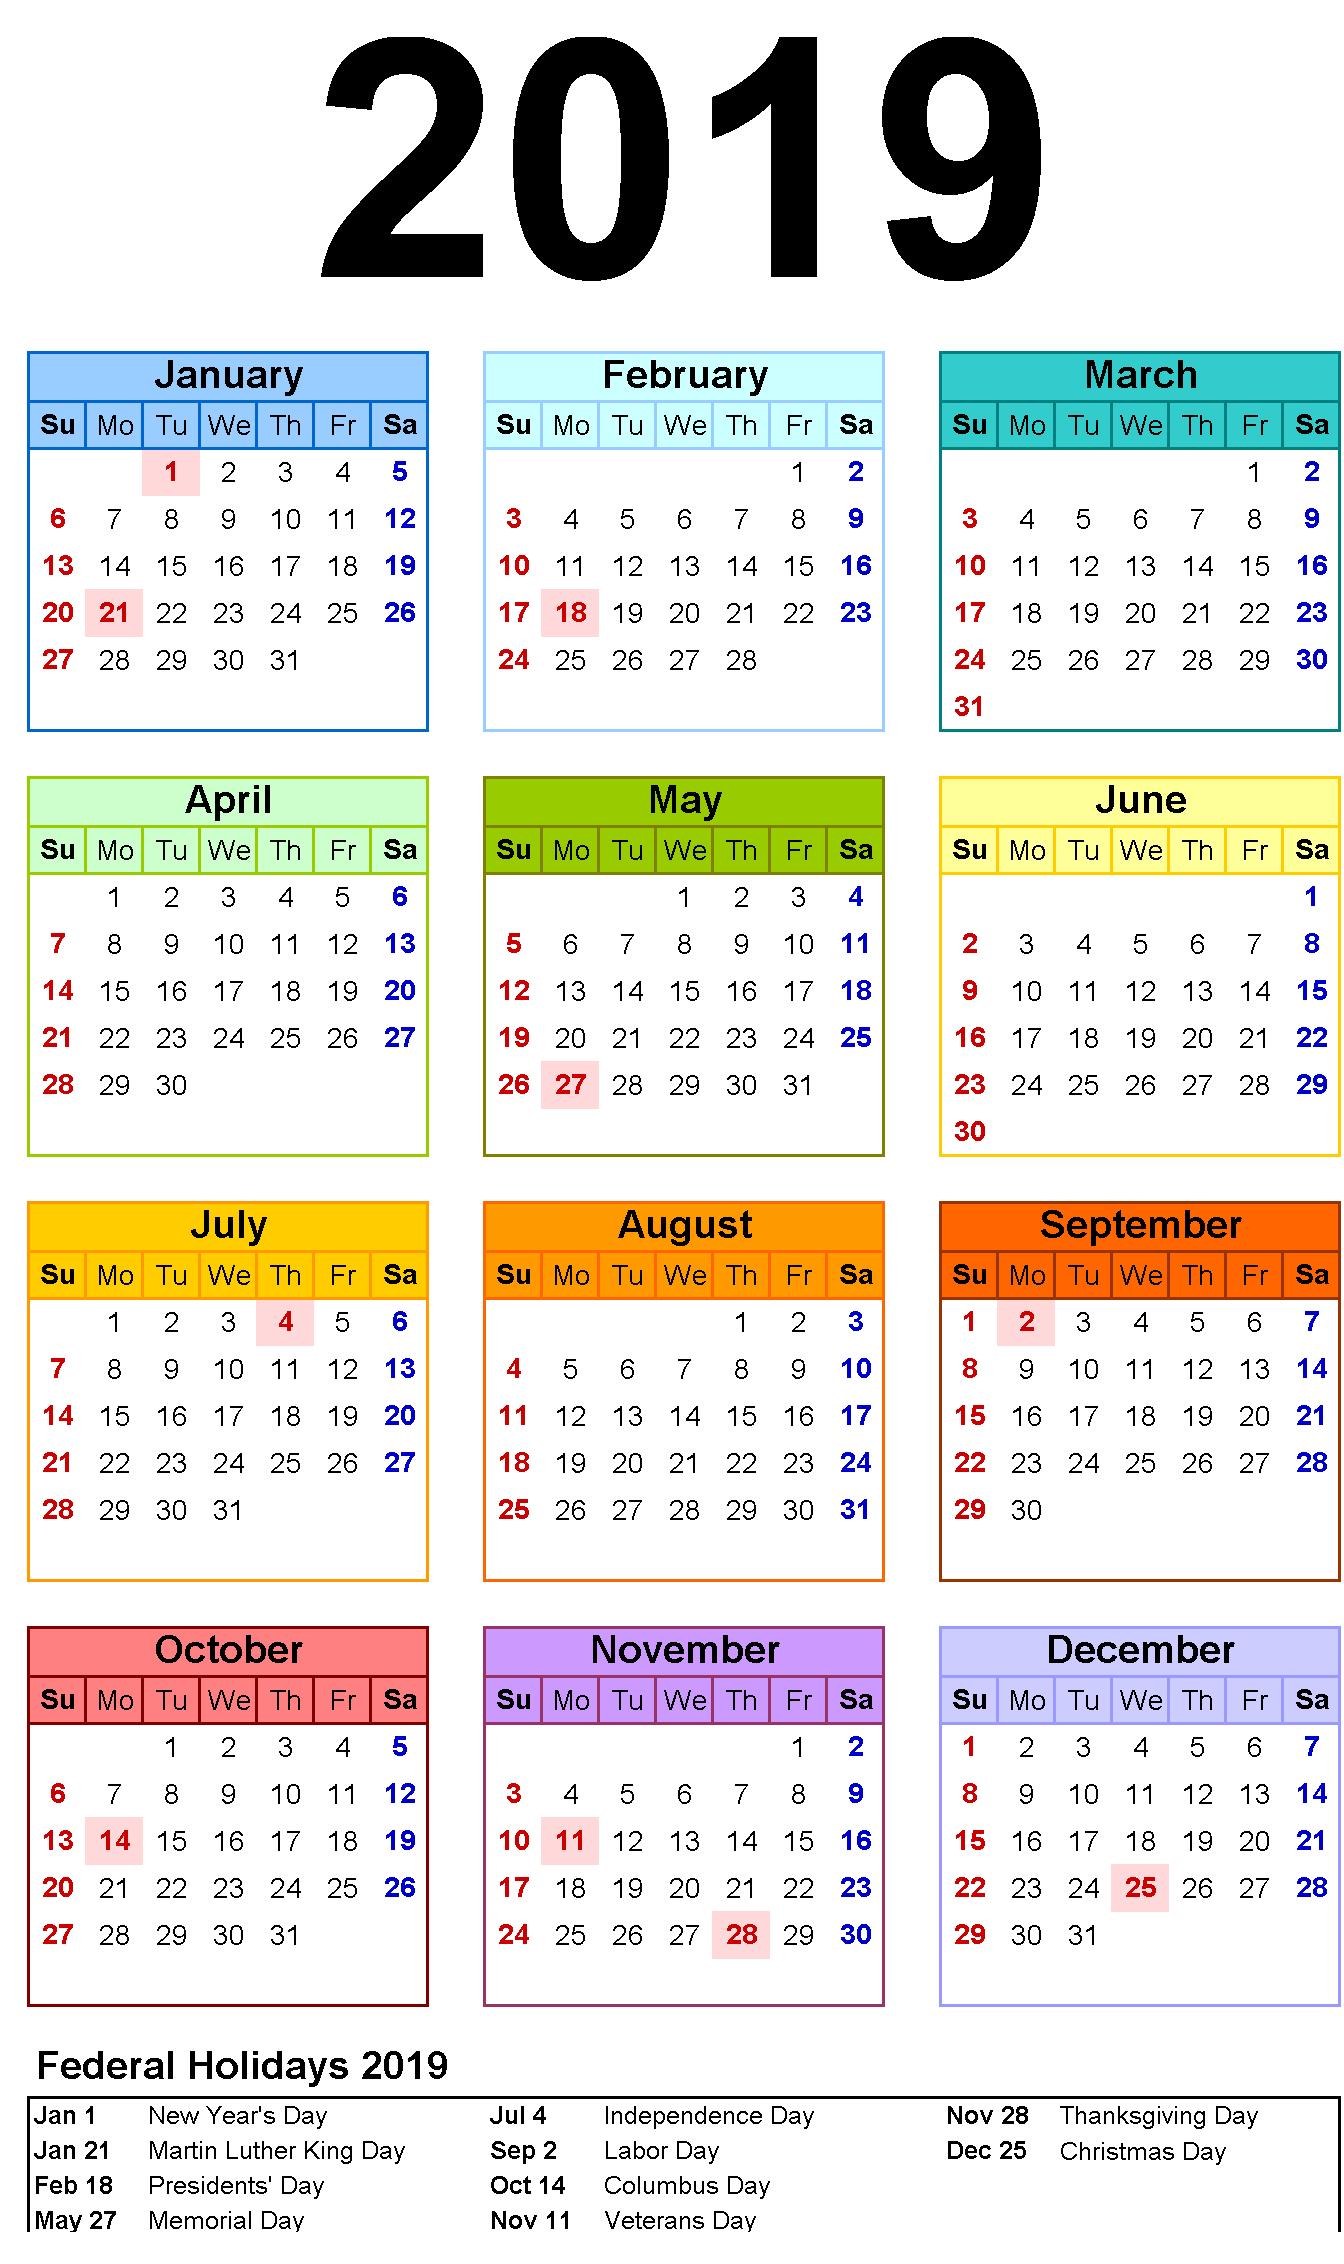 12 Month Calendar In One Page #2019Calendar #holidayscalendar Calendar 2019 Presidents Day